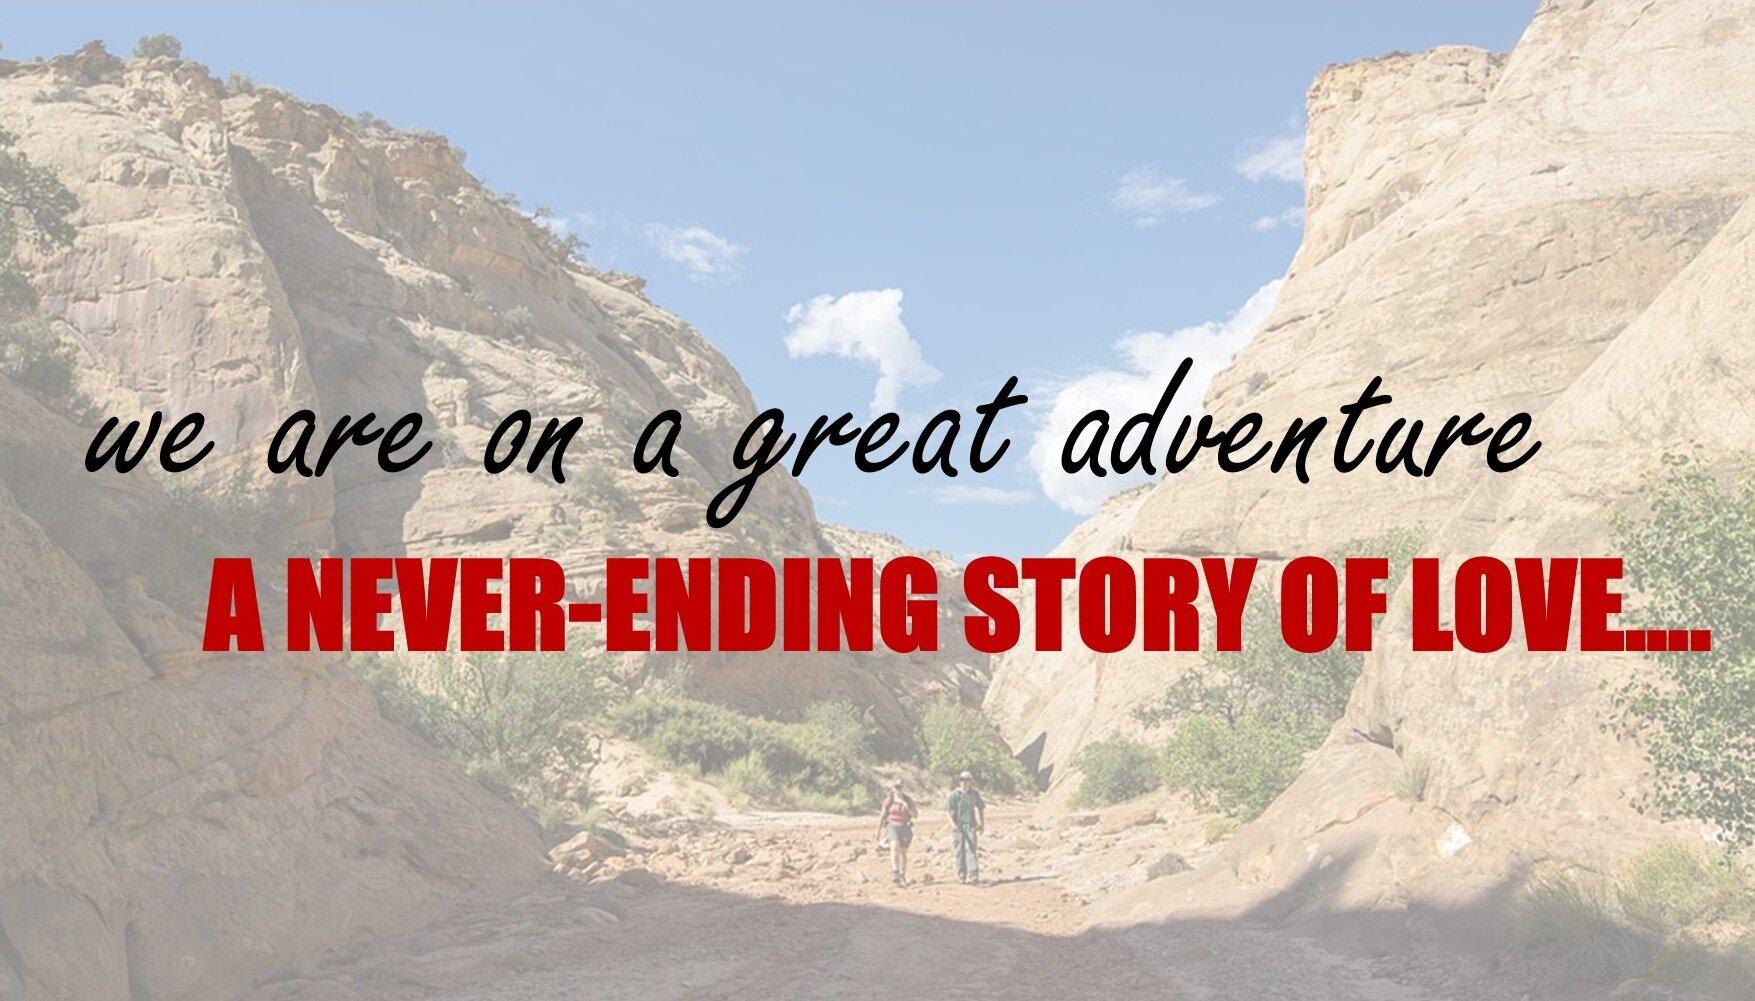 We are on never-ending adventure.jpg